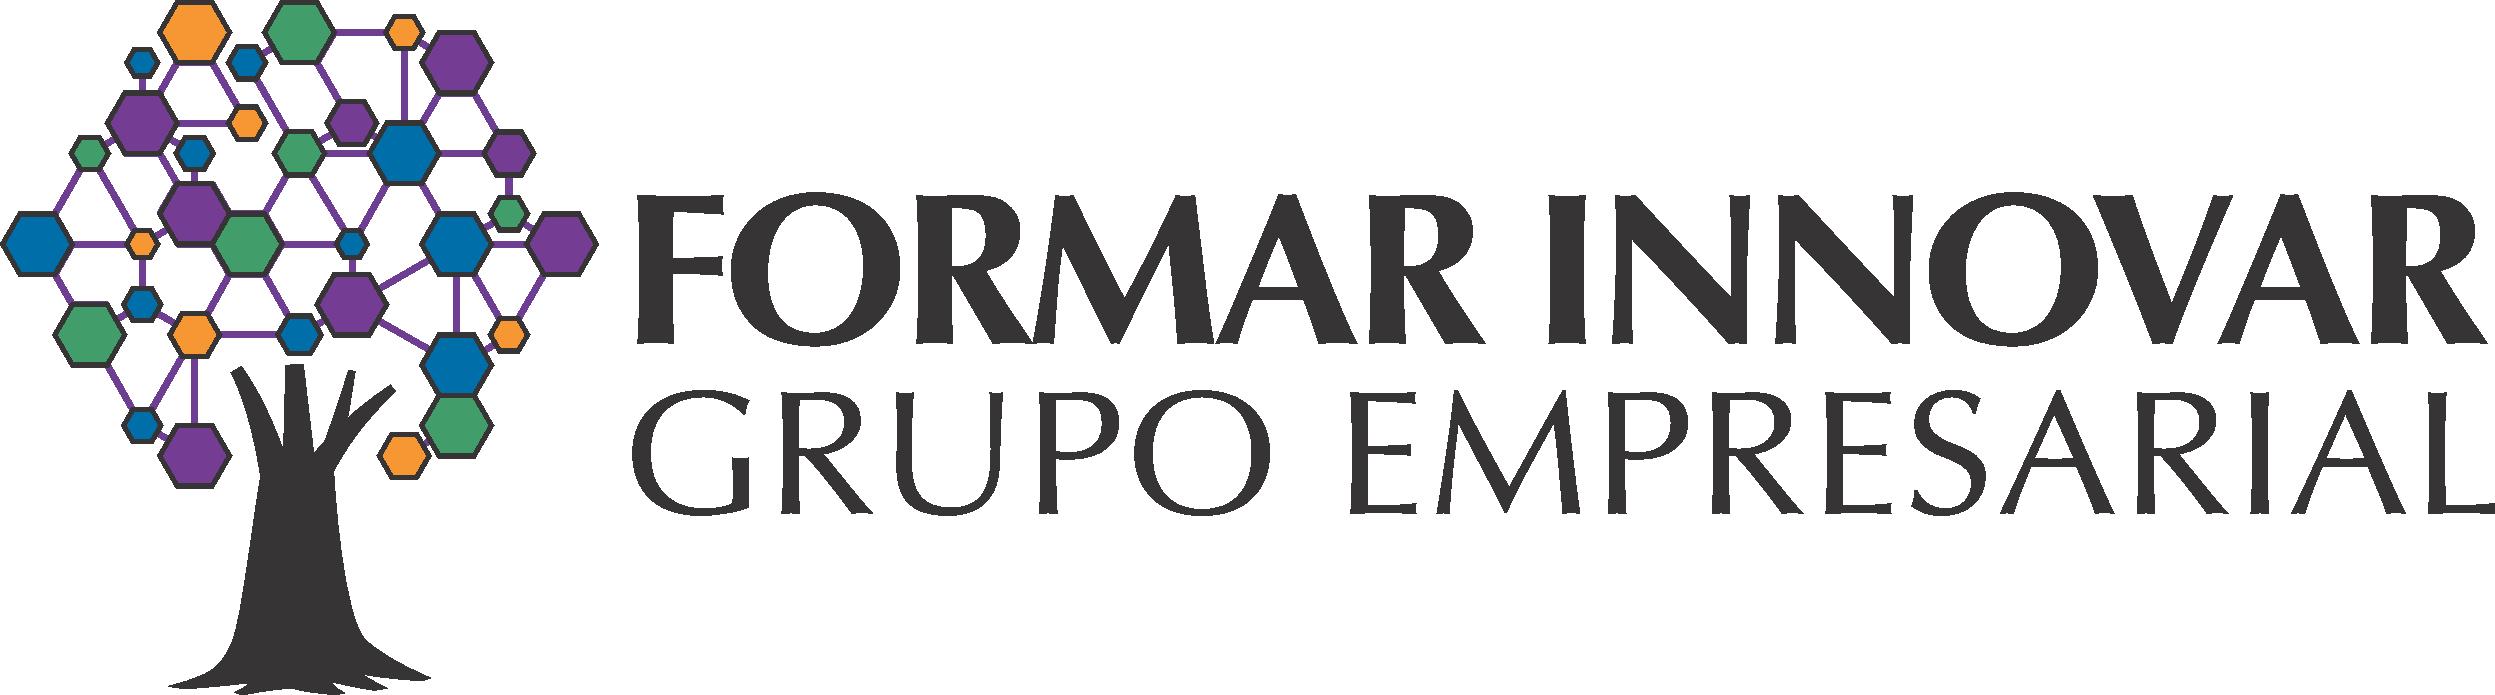 Formar Innovar Grupo Empresarial